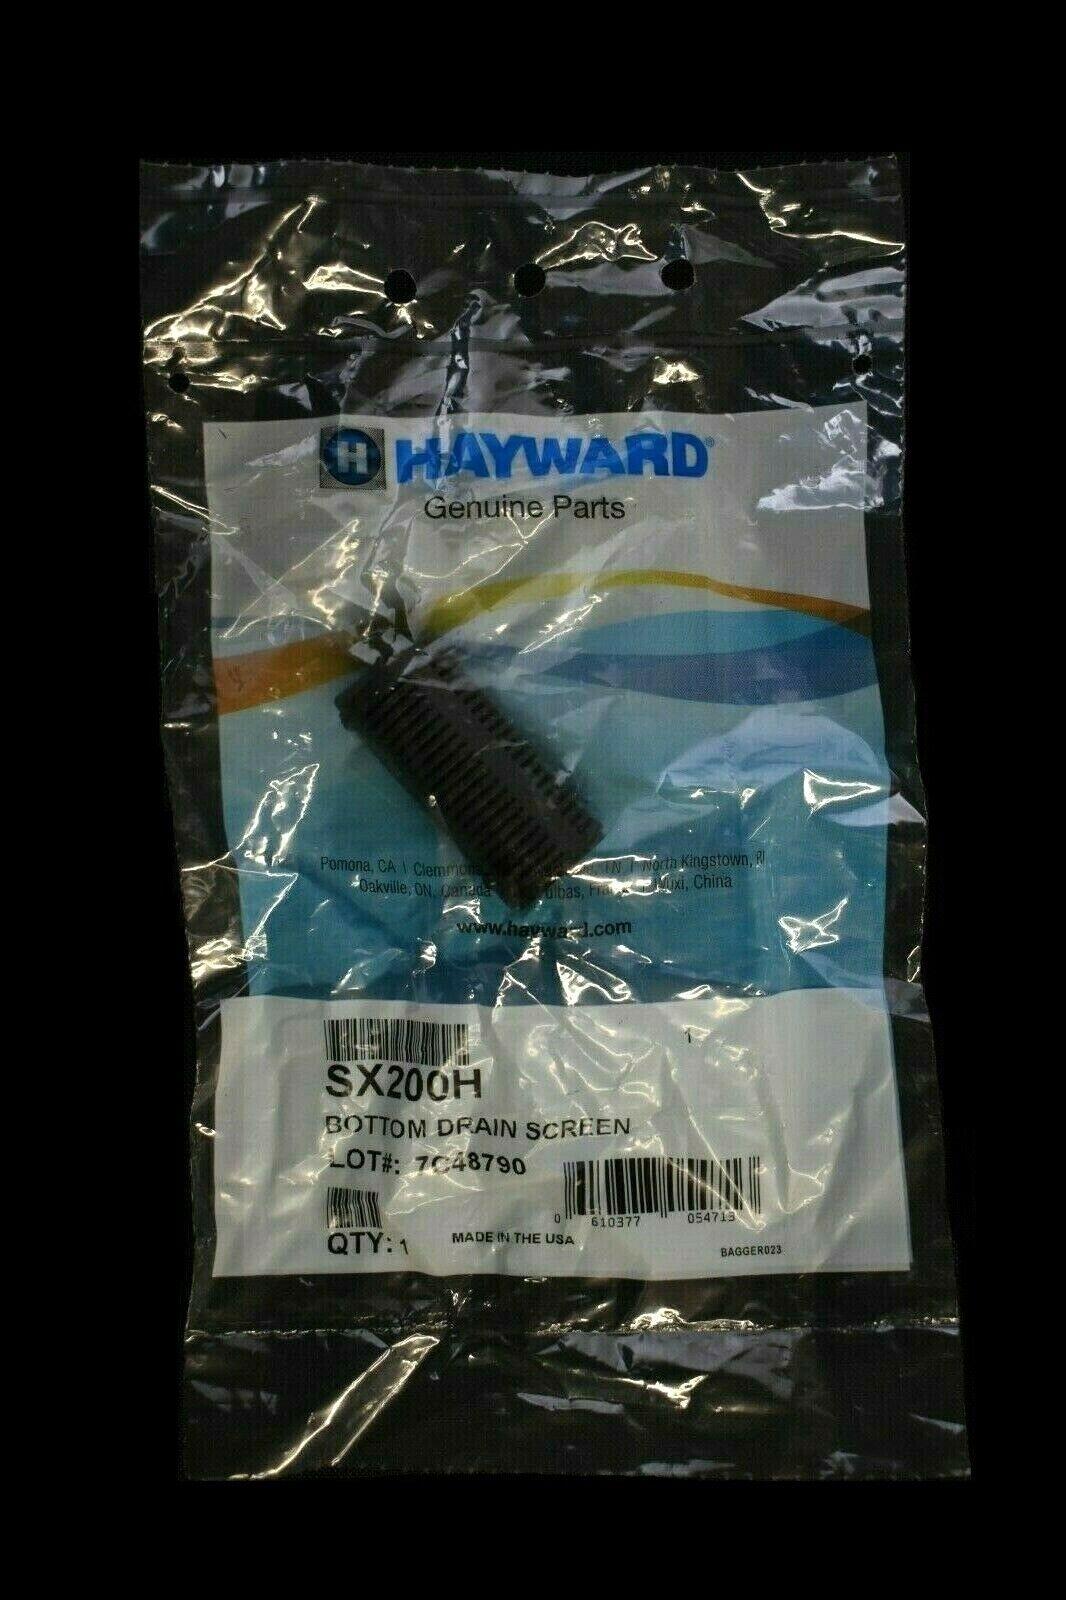 Genuine Hayward Sand Filter S244T S166T SX200H Bottom Drain Screen 2005 Prior